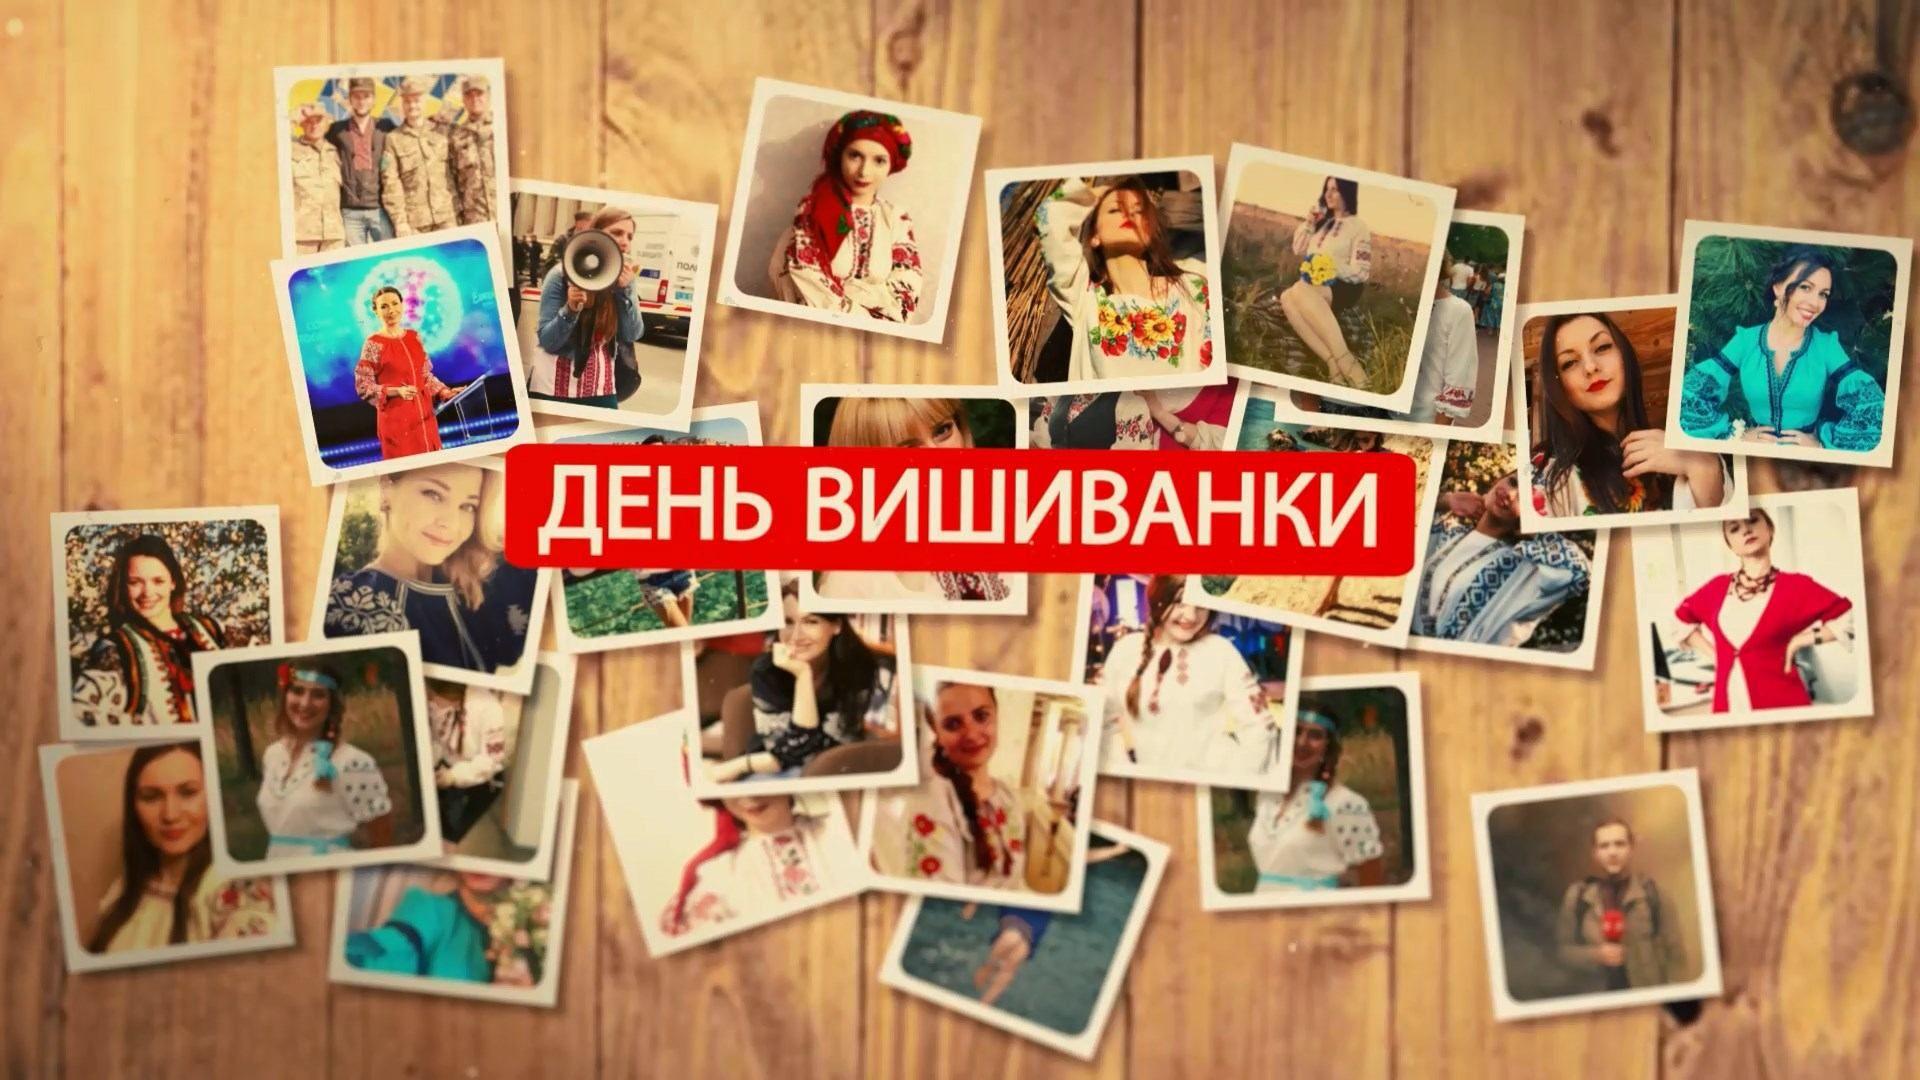 ef4a9f939de05a Команда 24 Каналу у вишиванках: захоплюючі фото - 24 Канал